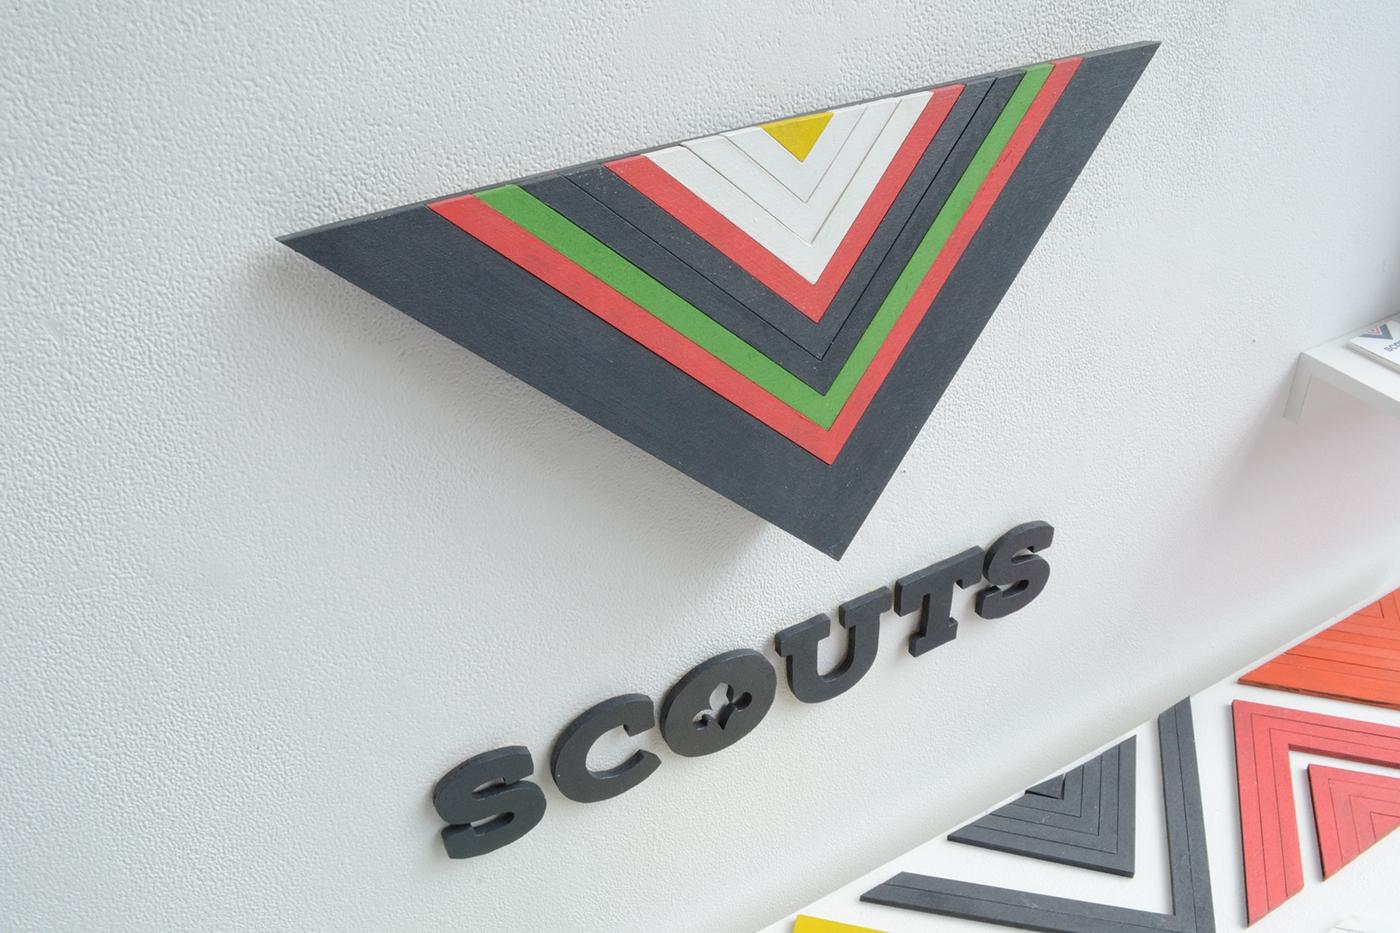 branding  graphic design  identity graduation project scouts scouting grafisch ontwerpen